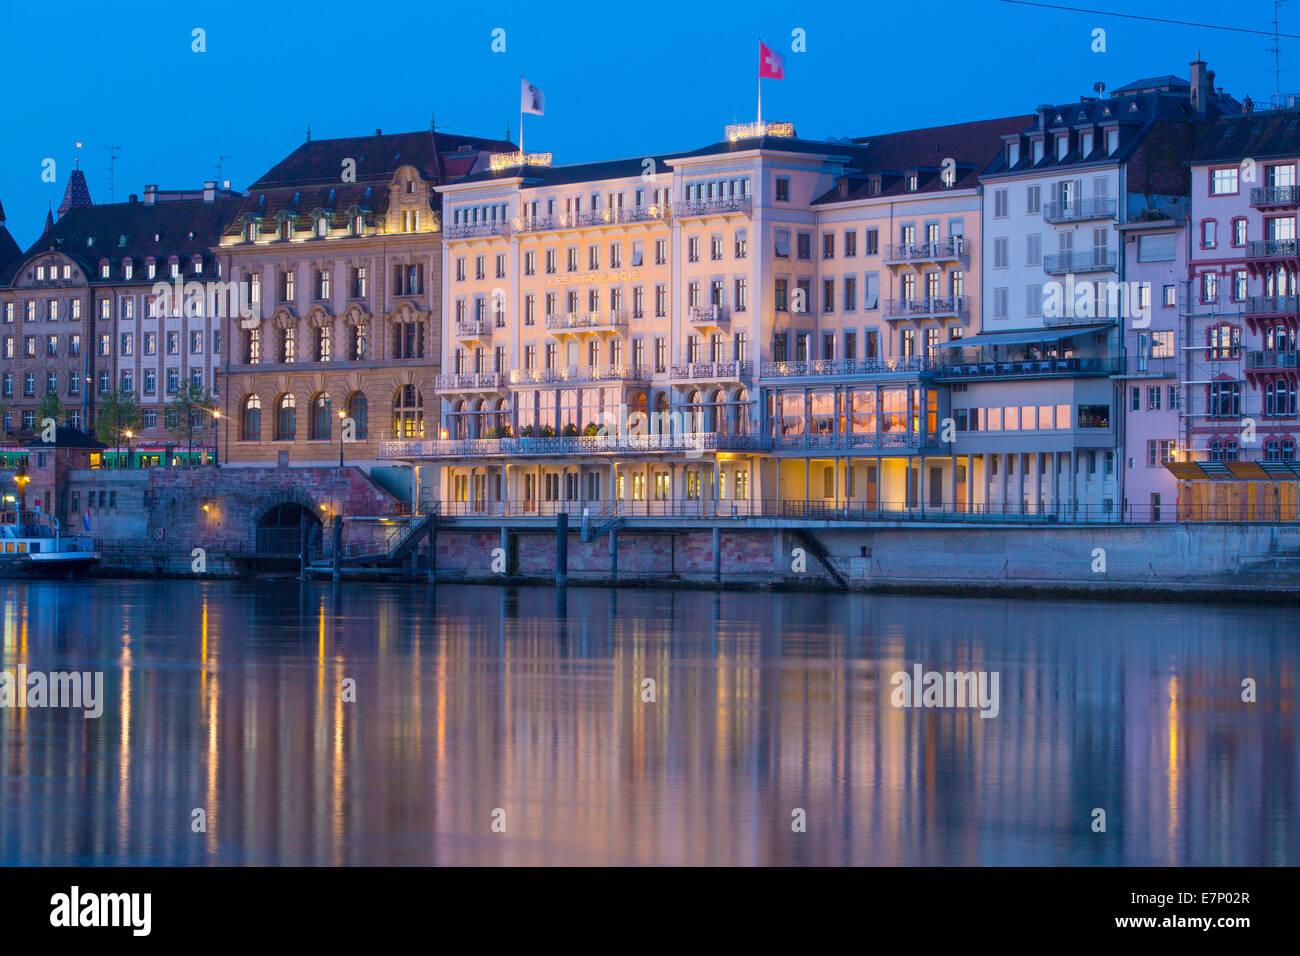 Rhine, hotel, Les trois rois, town, city, Basel, Rhine, at night, river, flow, Switzerland, Europe, - Stock Image